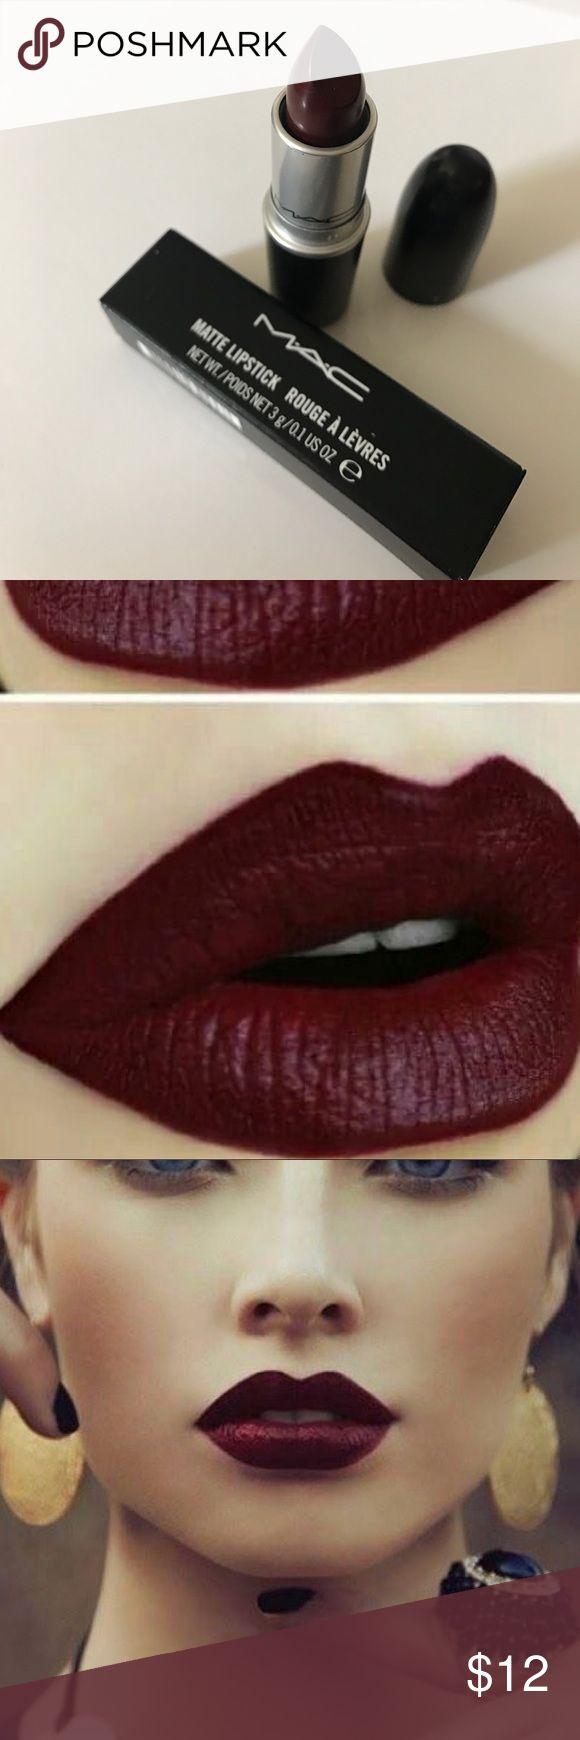 "MAC ""Sin"" Lipstick (NEW IN BOX!) Brand new in box, 100% authentic Mac lipstick in the hottest fall/winter shade ""sin"". MAC Cosmetics Makeup Lipstick"